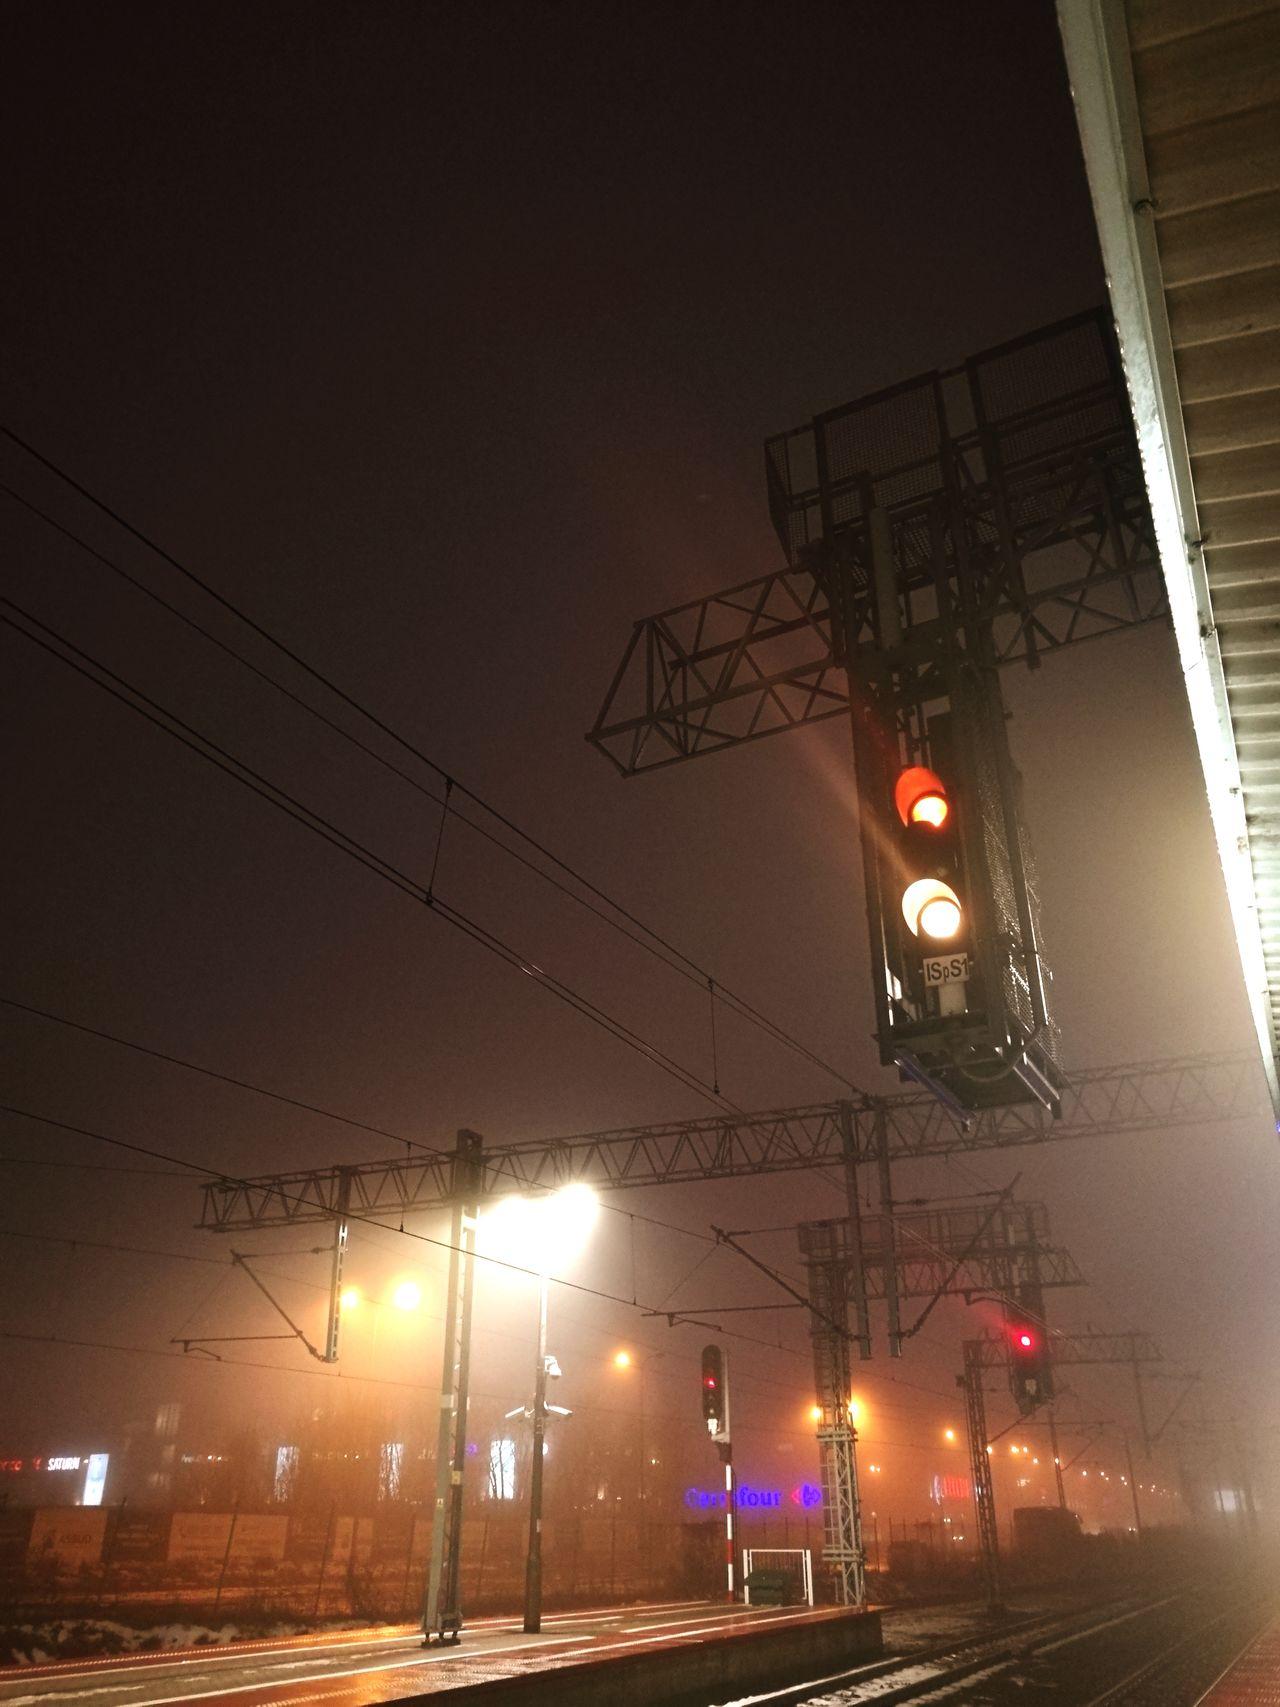 No People Black Background Train Train Station Lights Train Lights